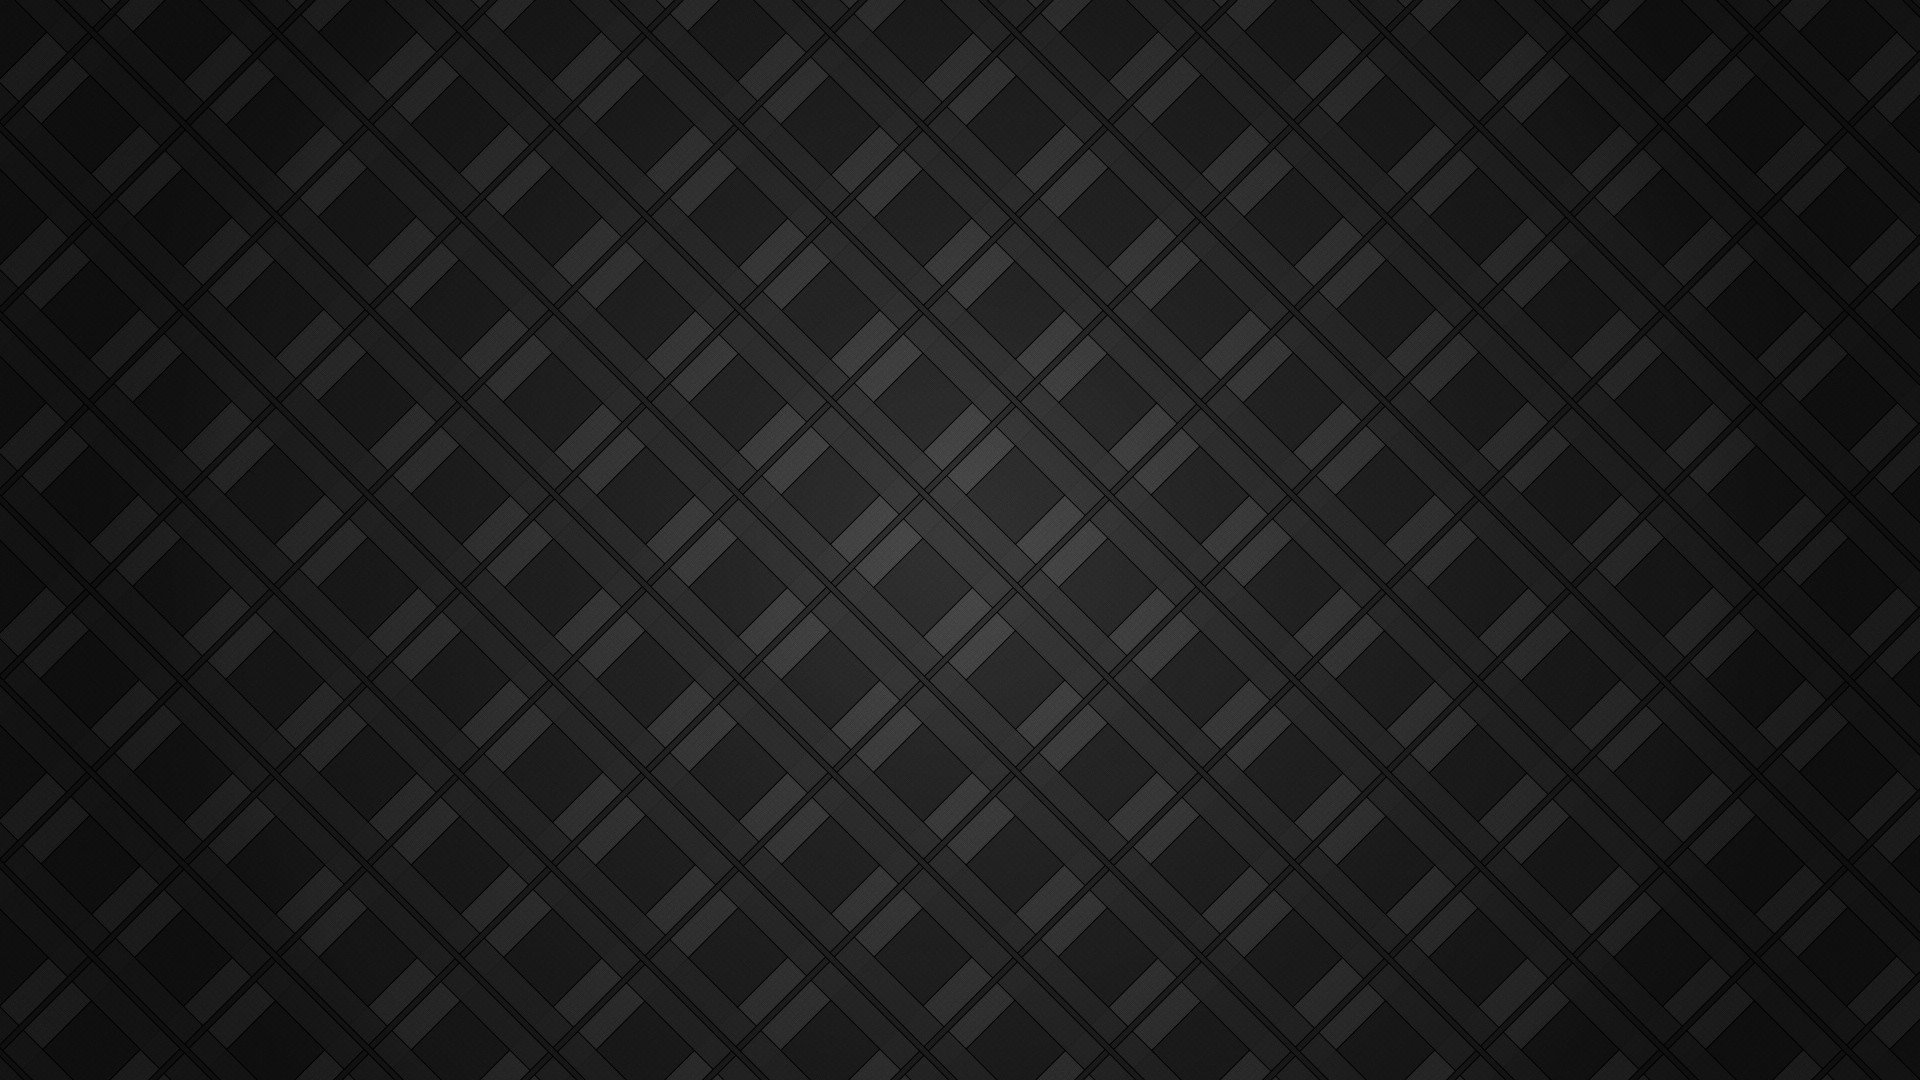 Wallpaper monochrome, grid, background, crossing, lines, dark